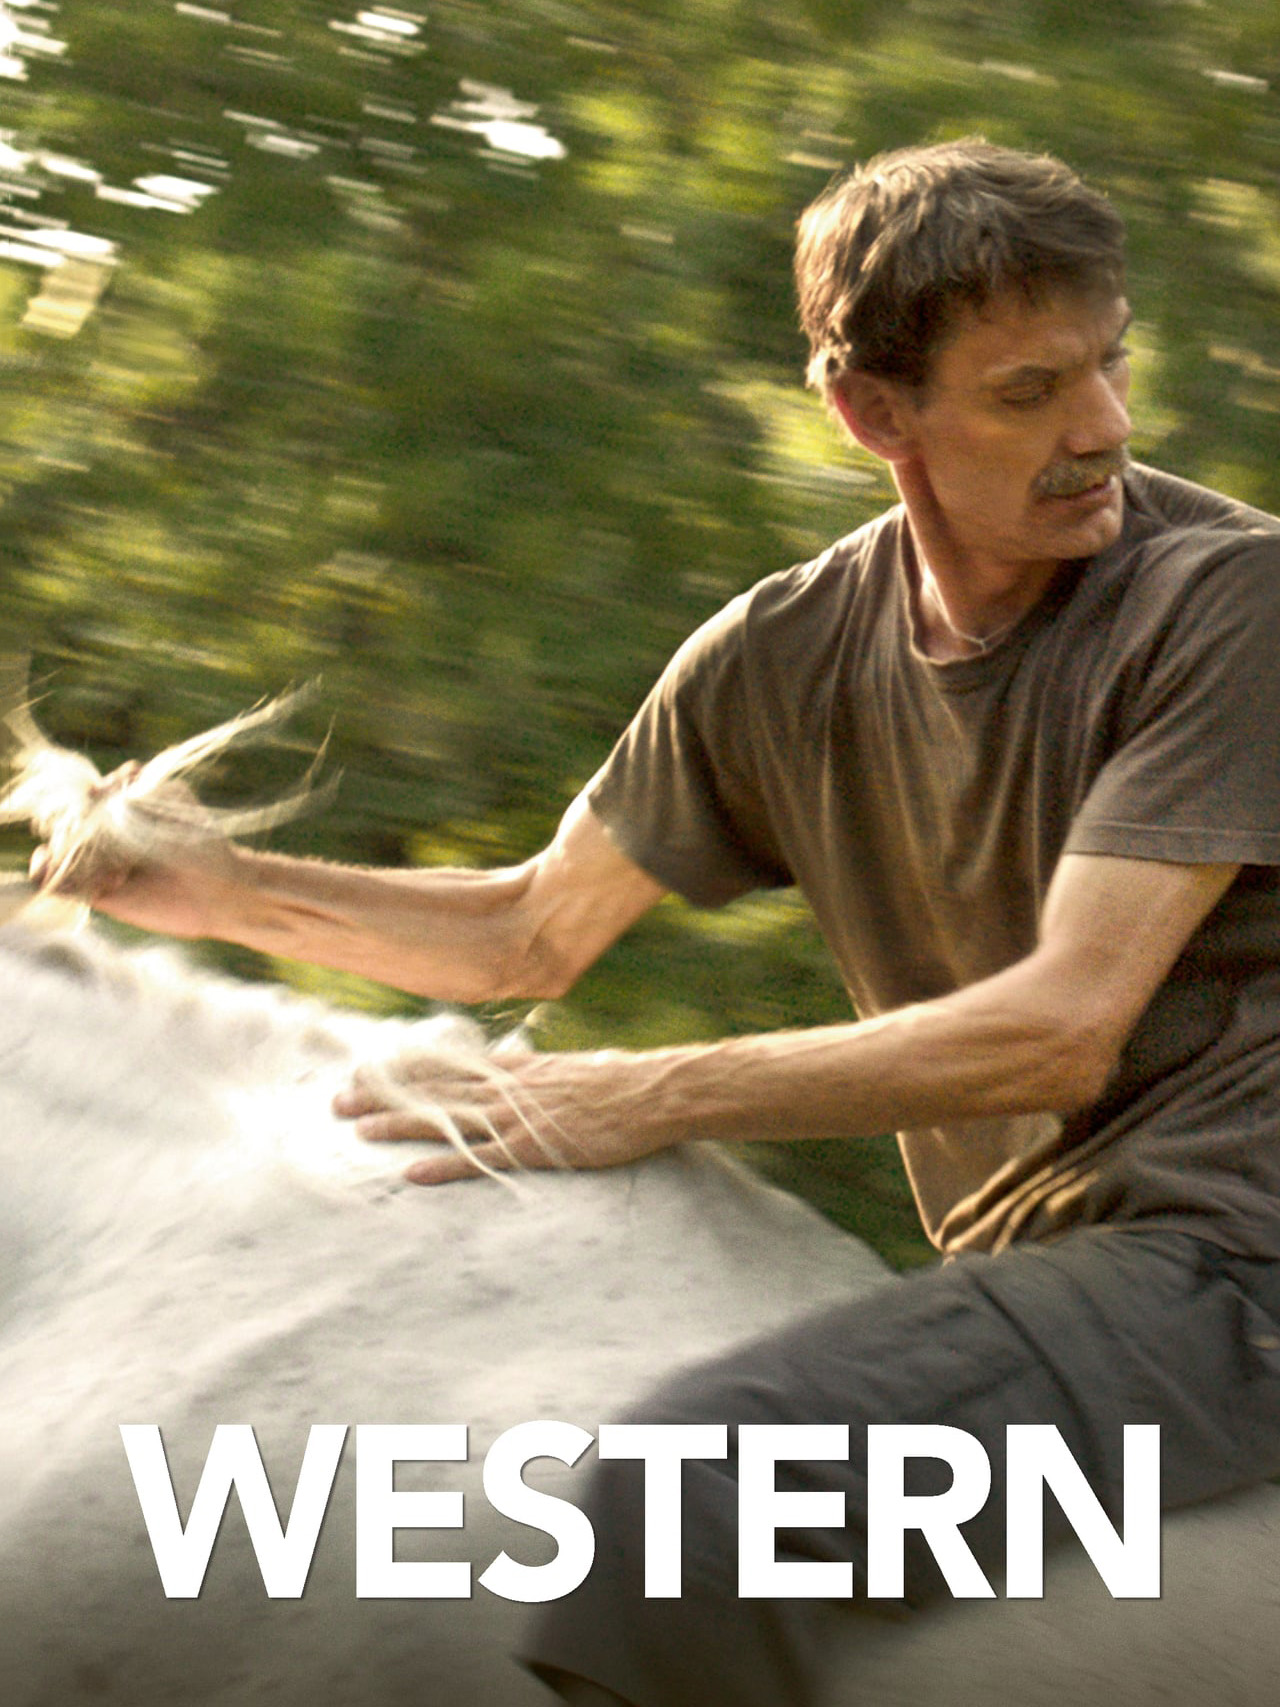 Western | Grisebac, Valeska (Réalisateur)